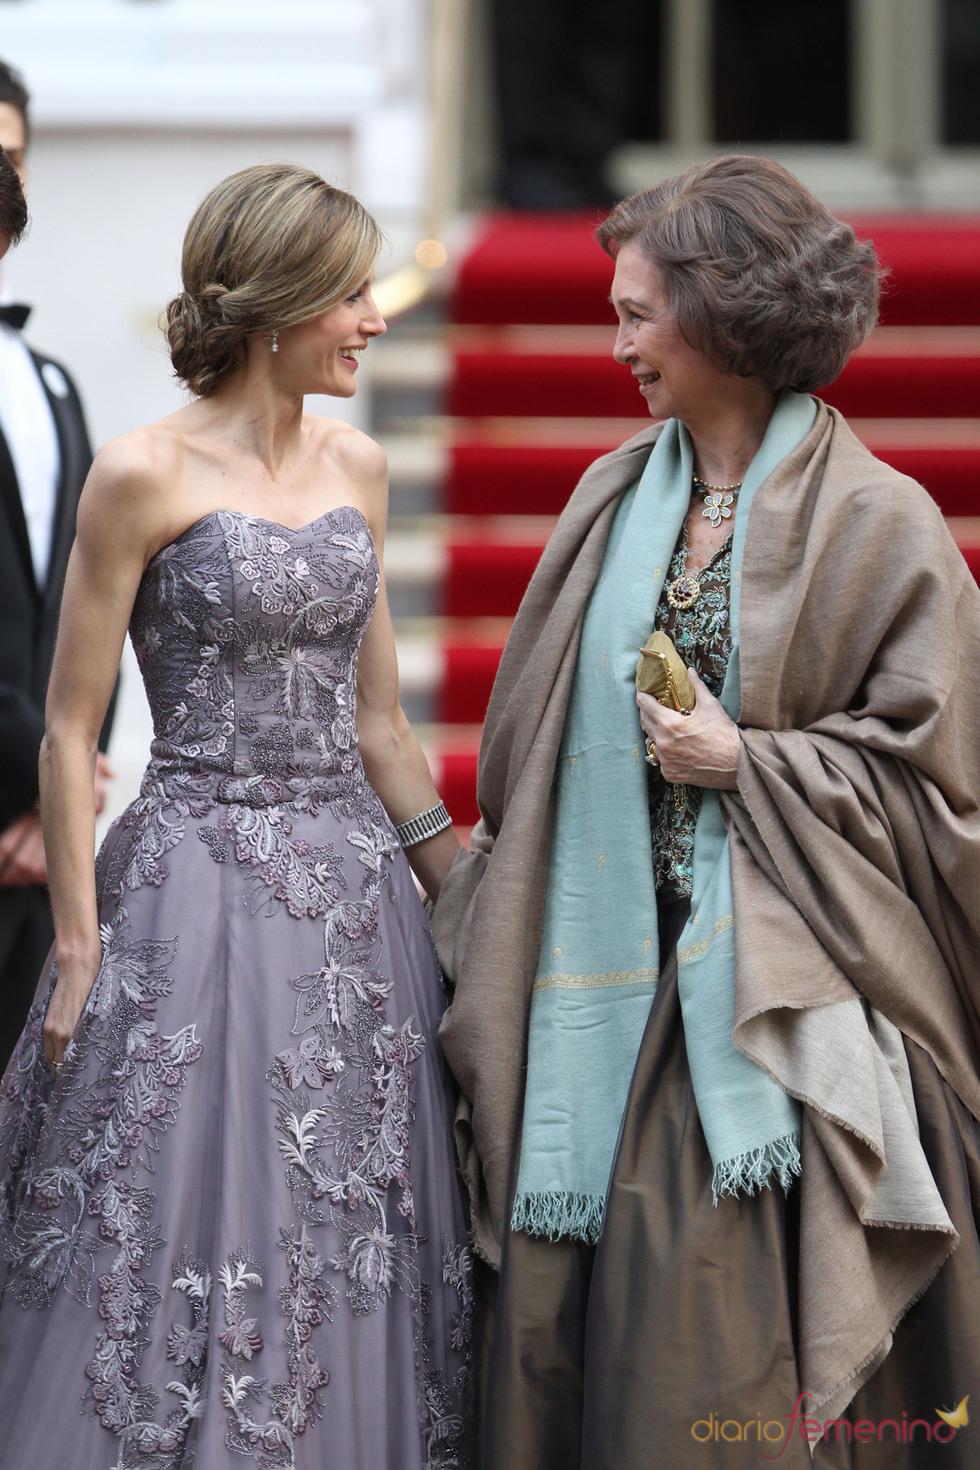 La Princesa Letizia habla con la Reina Sofía en la cena pre-boda real de Inglaterra